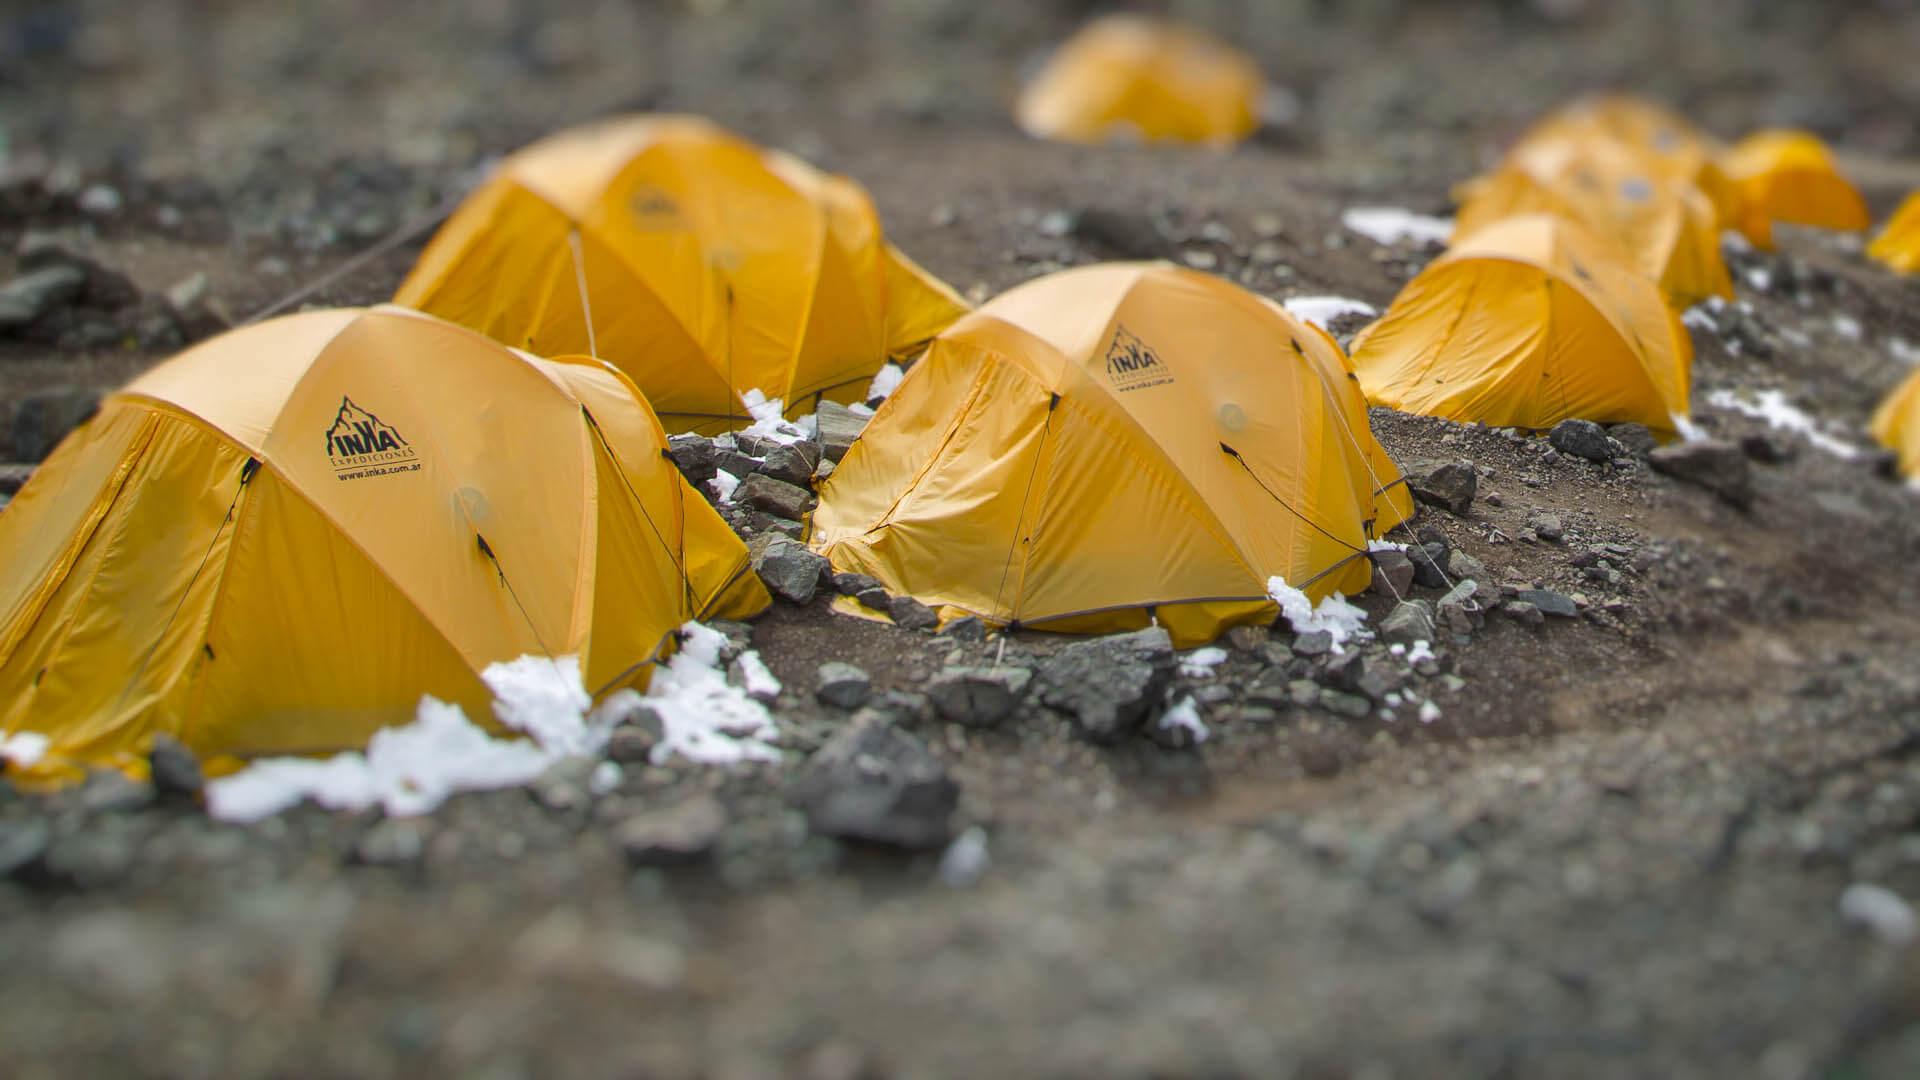 Aconcagua Tents